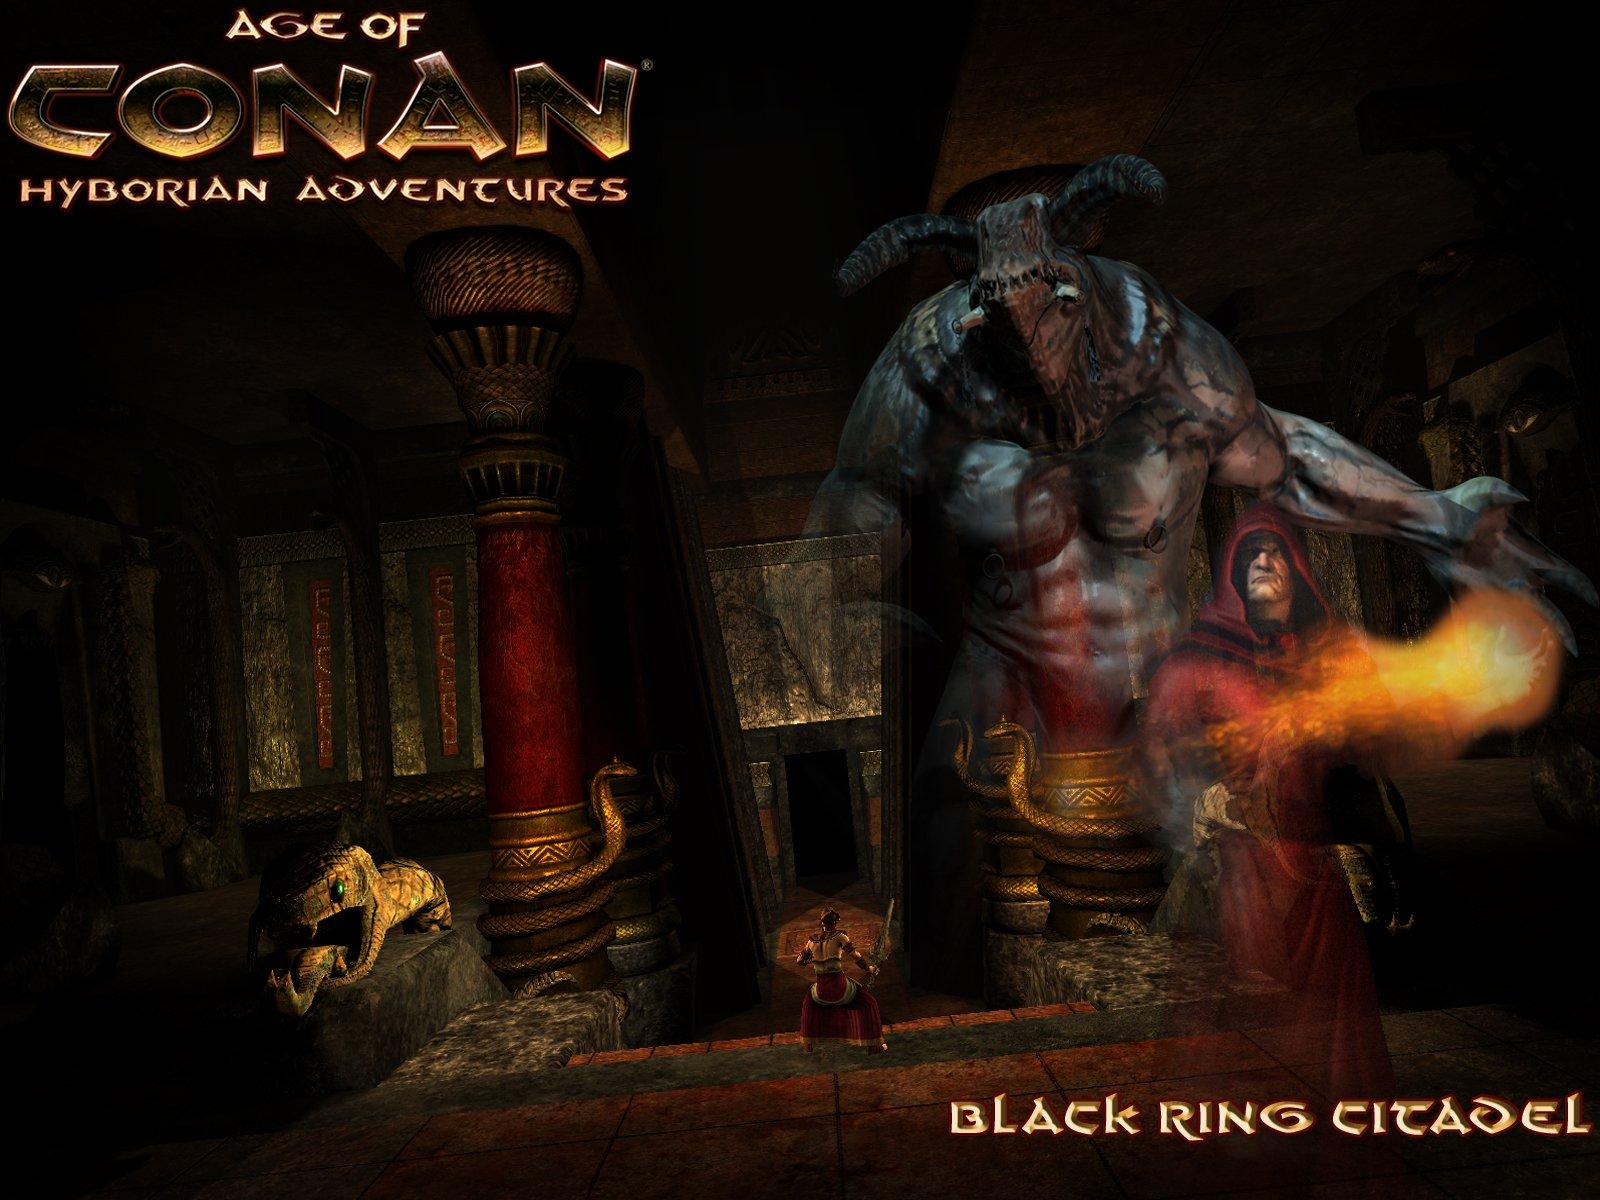 Age of Conan wallpaper 3